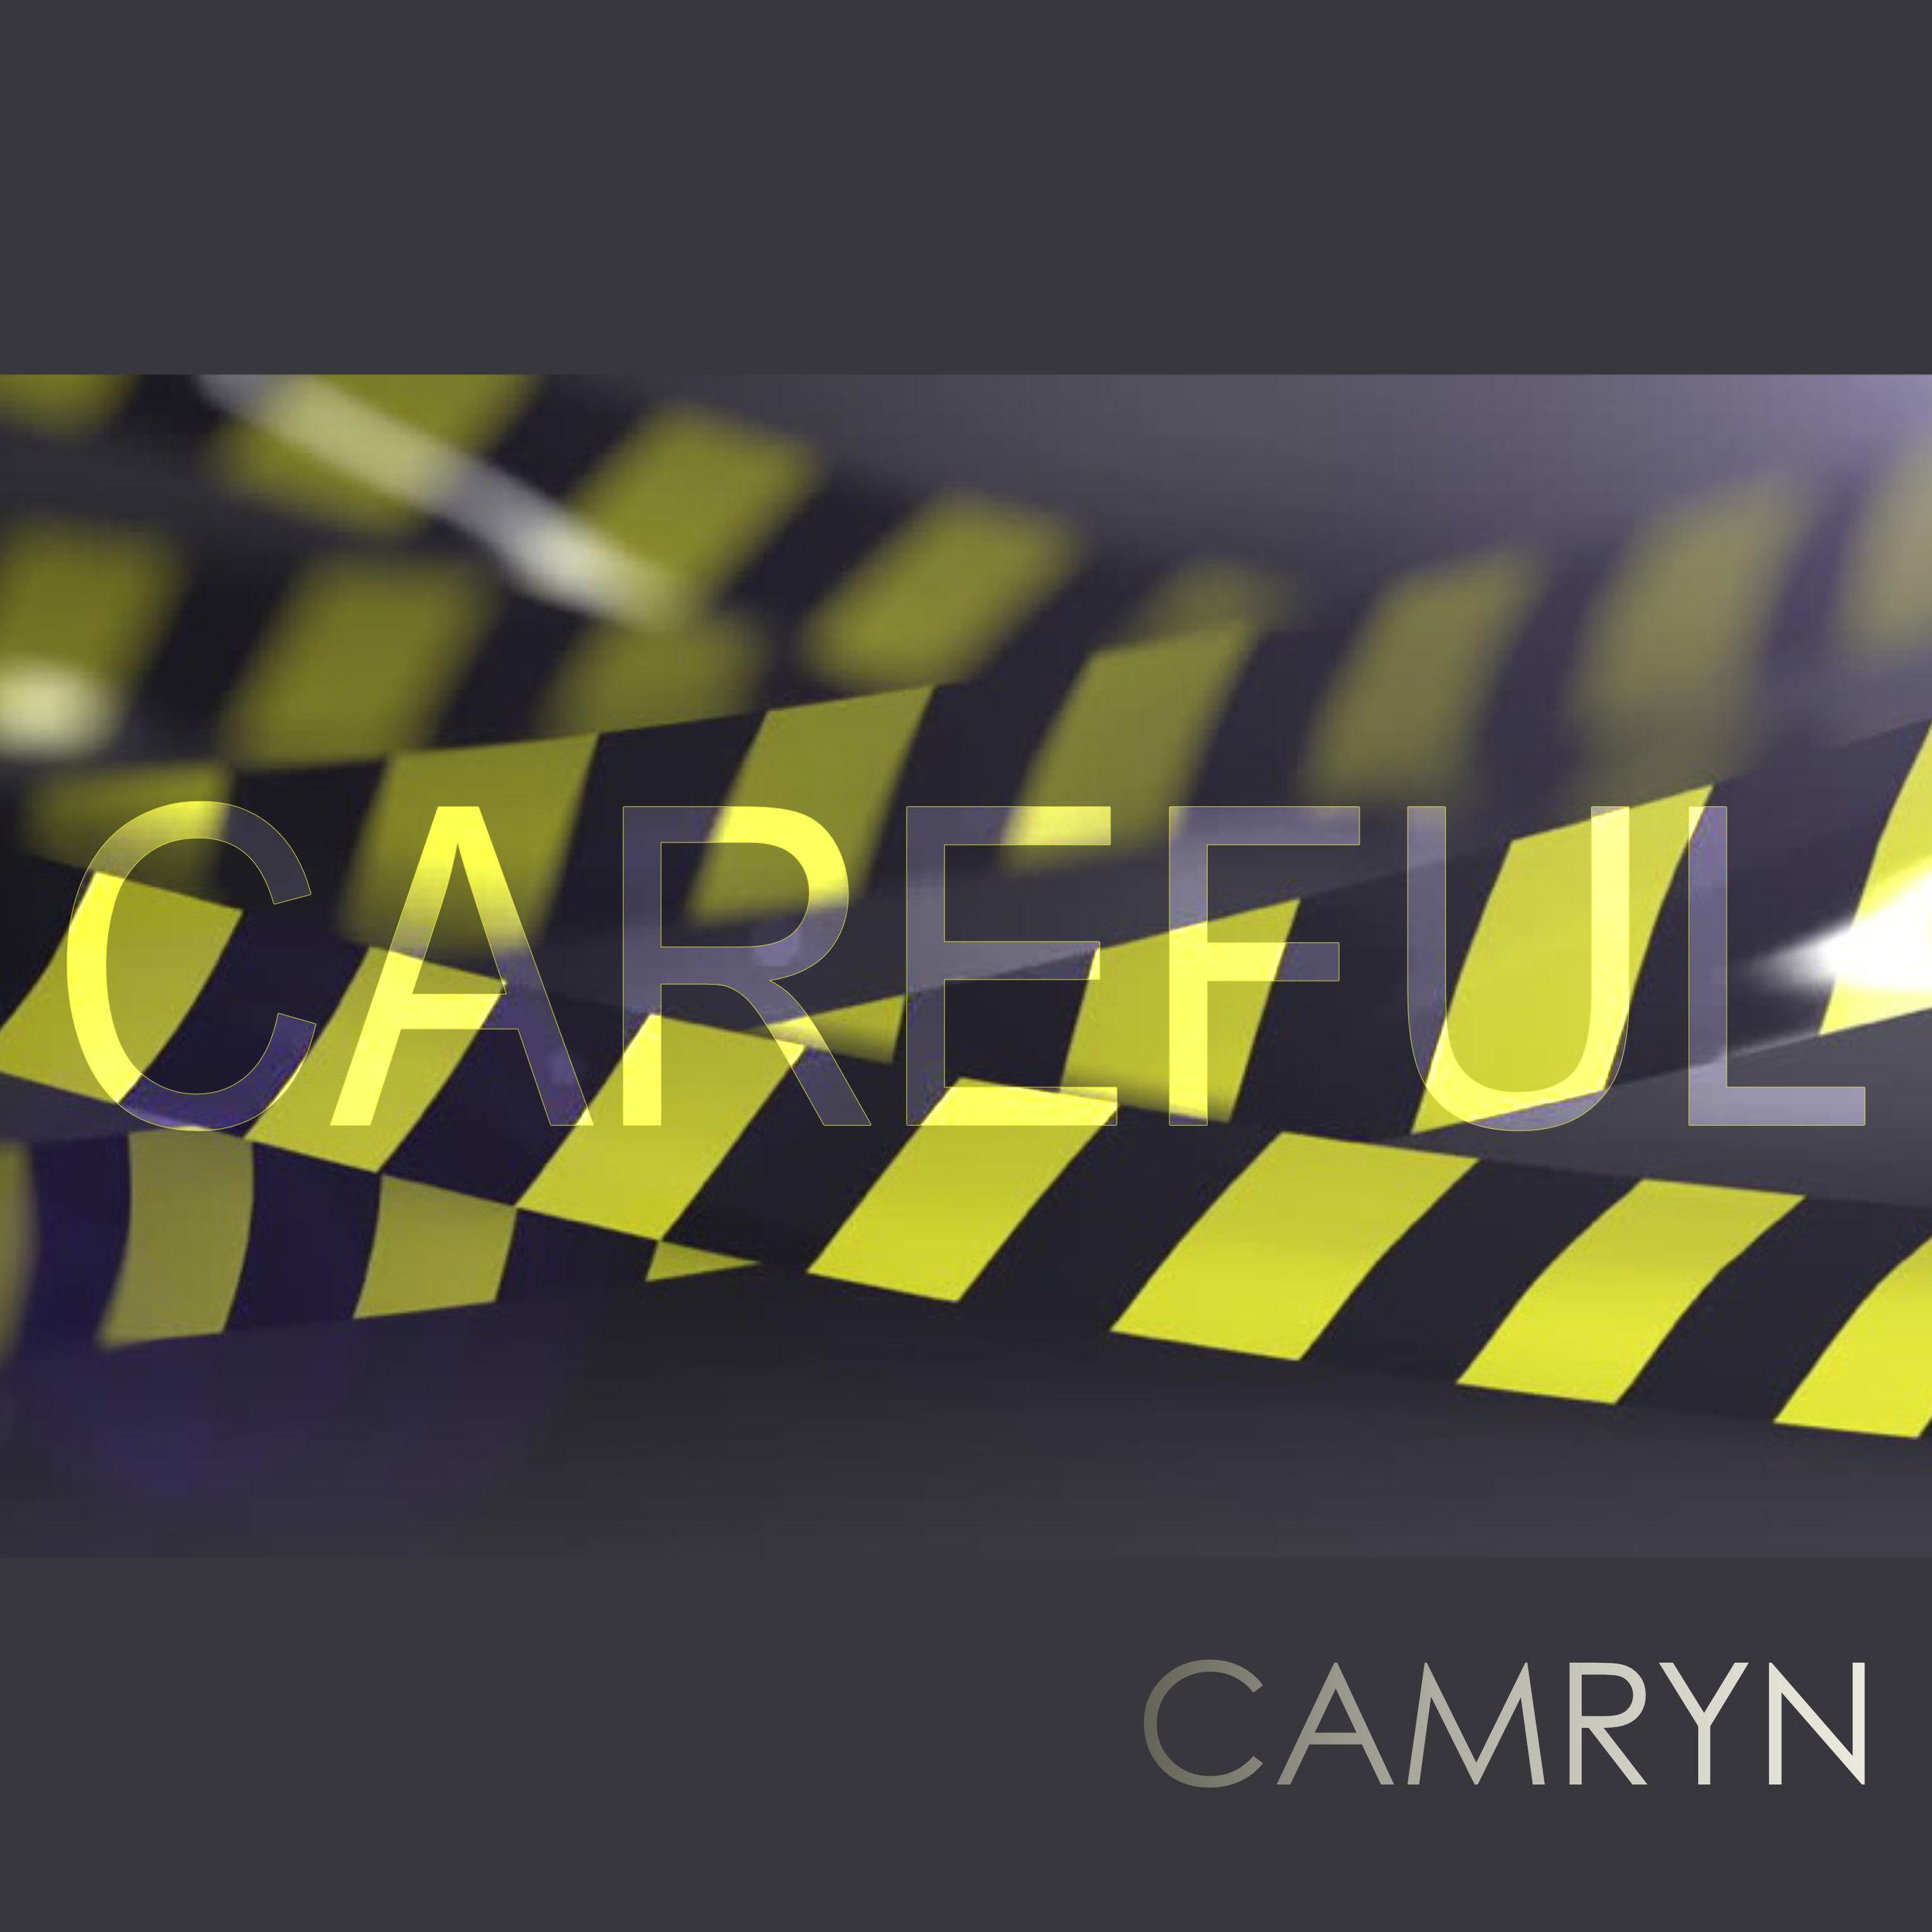 careful_camryn